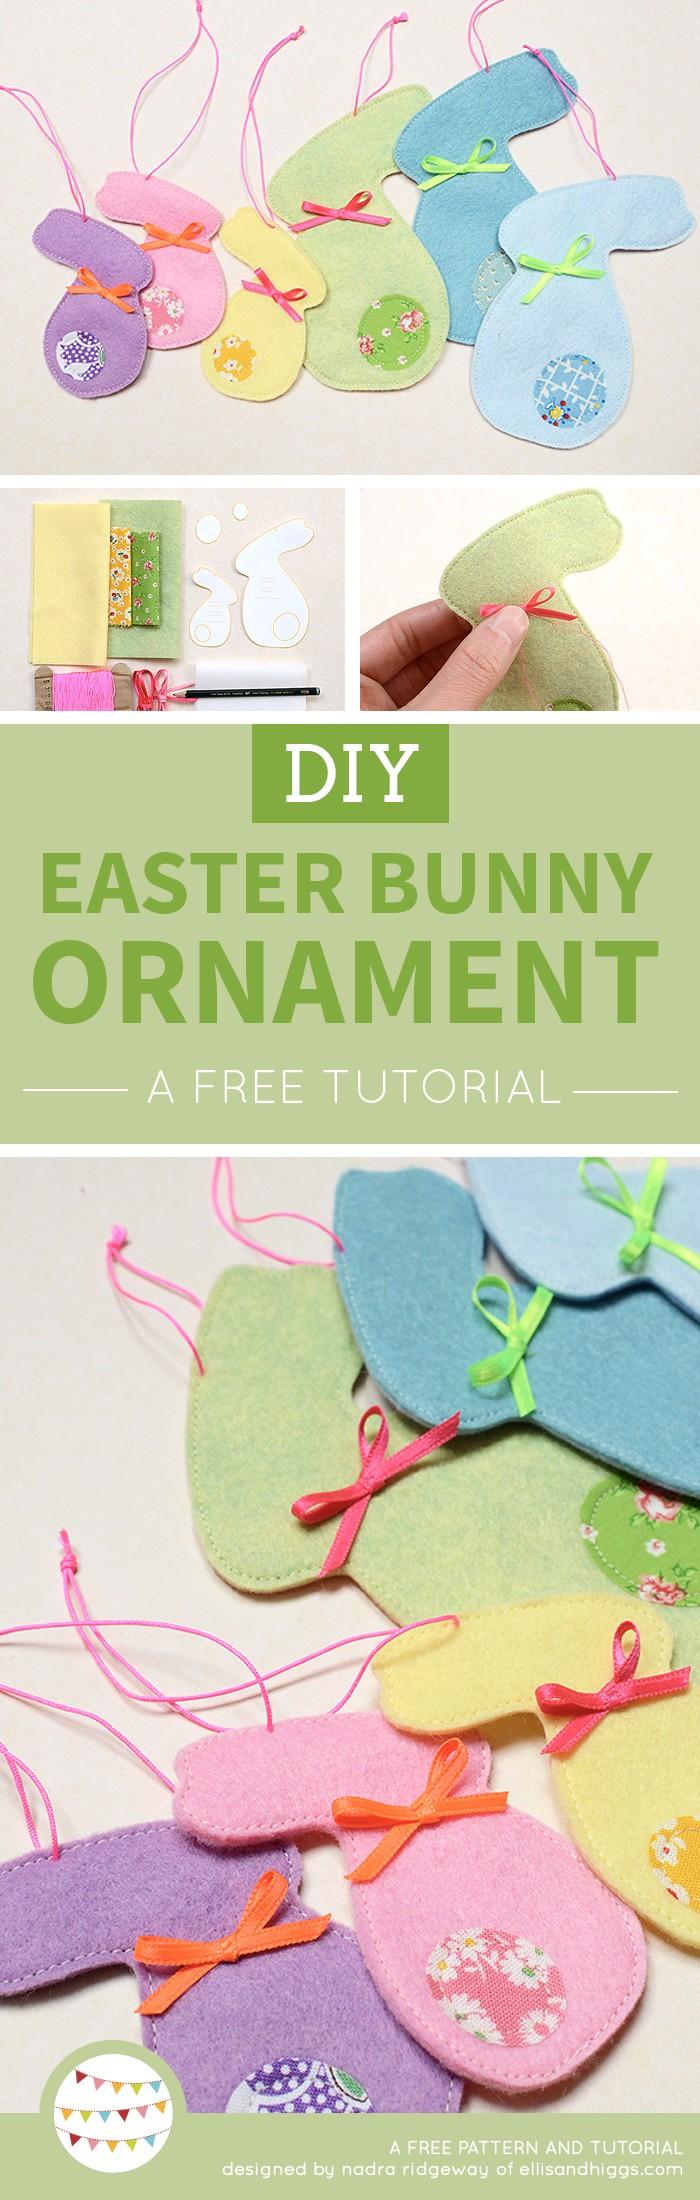 Osterhasen Anhänger aus Filz und Stoff / Felt and Fabric Easter Bunny Ornaments